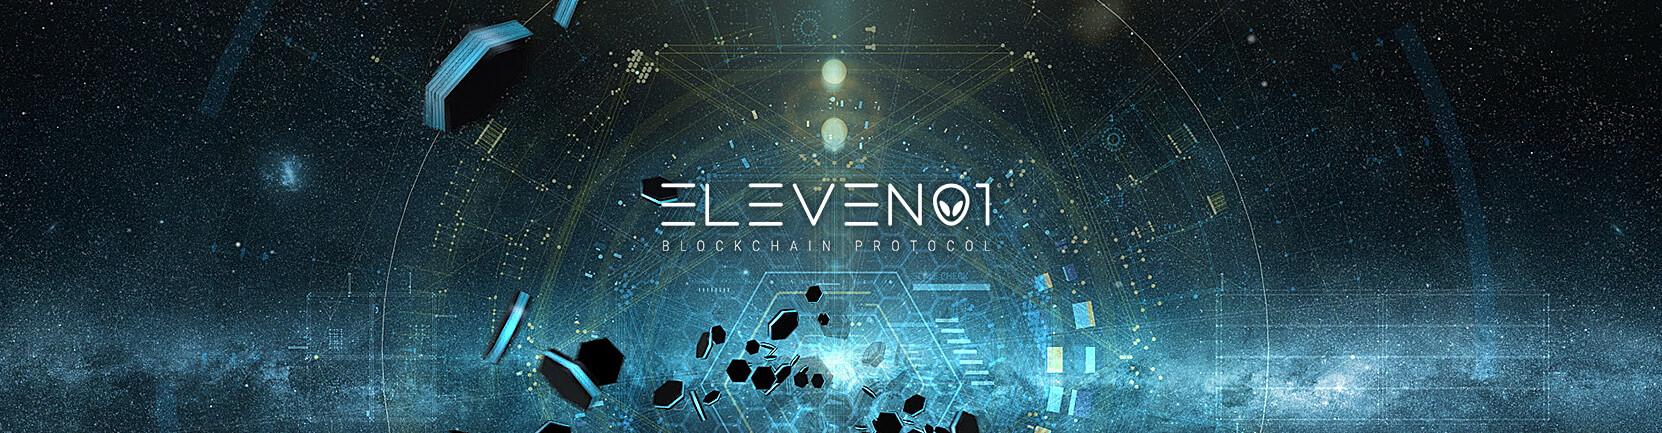 New-Eleven01A